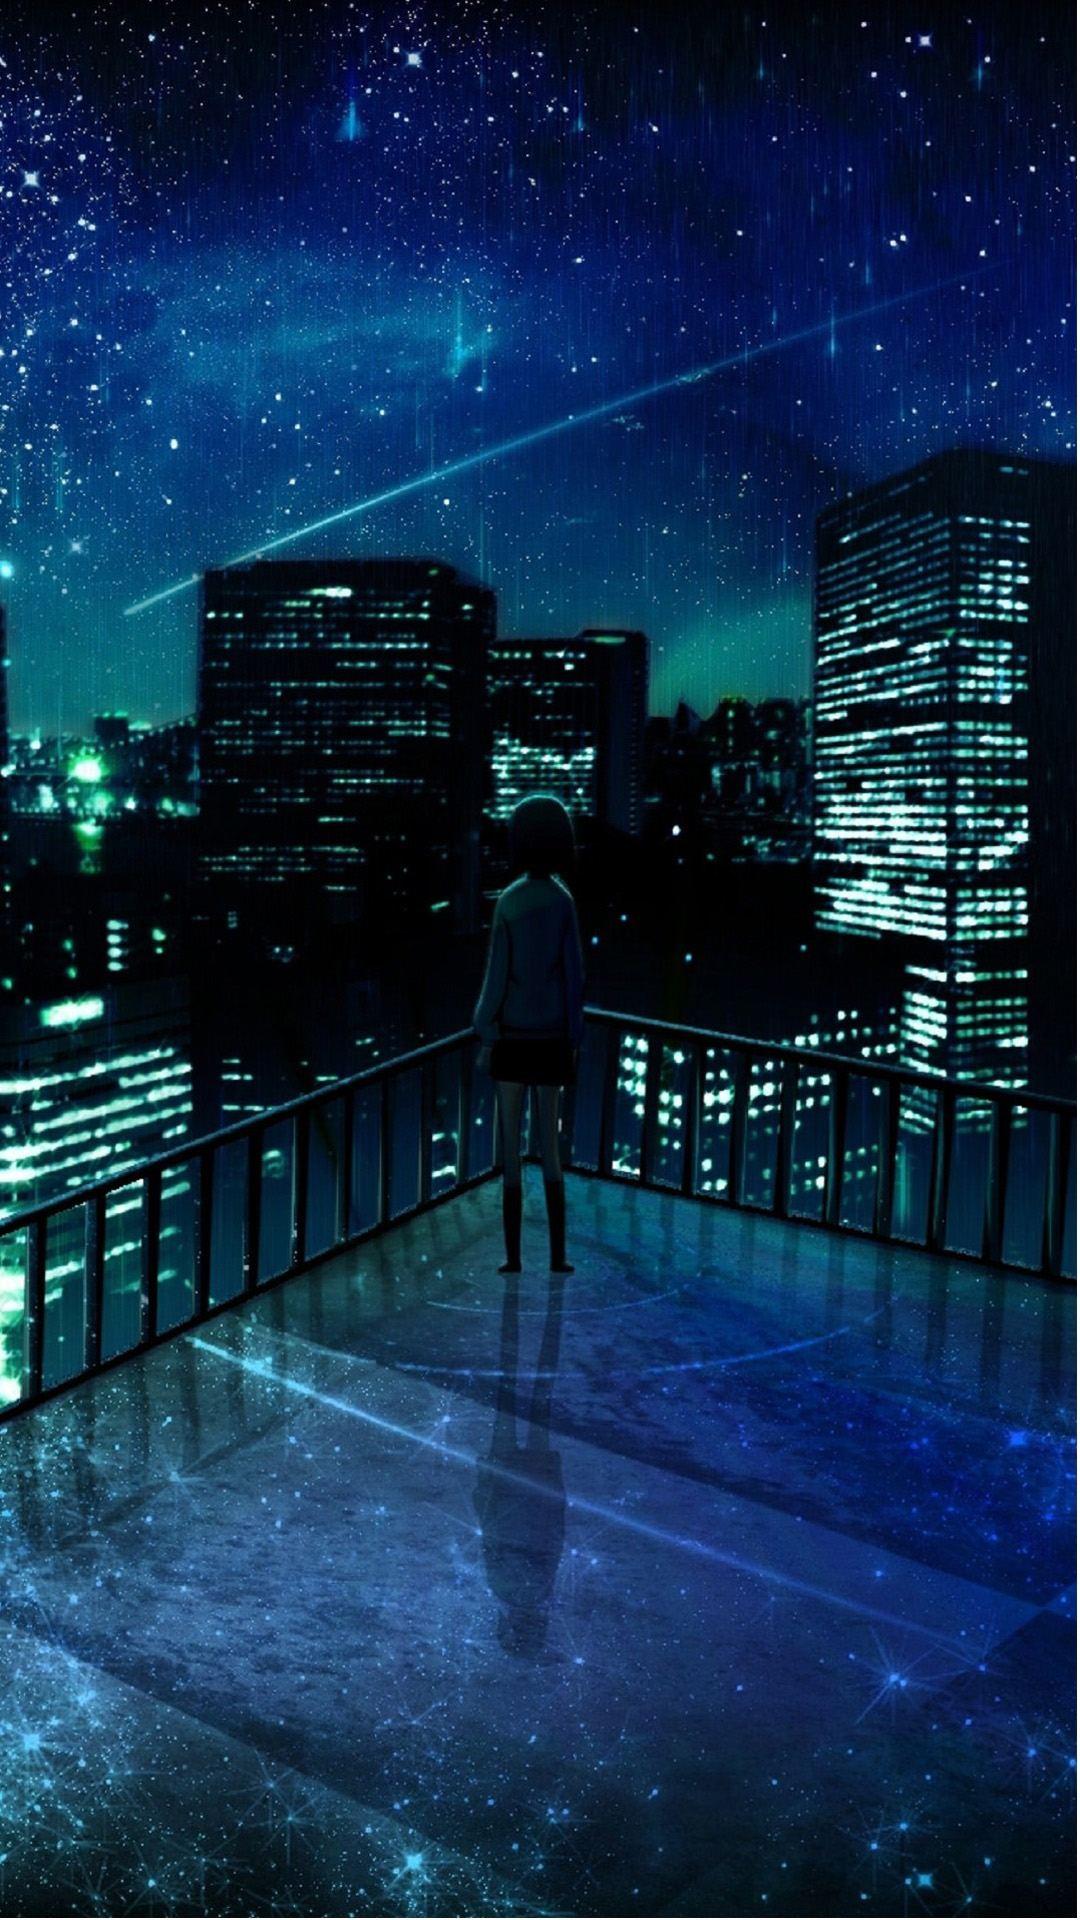 Girl Looking At Falling Star iPhone 6 Plus HD Wallpaper (1)